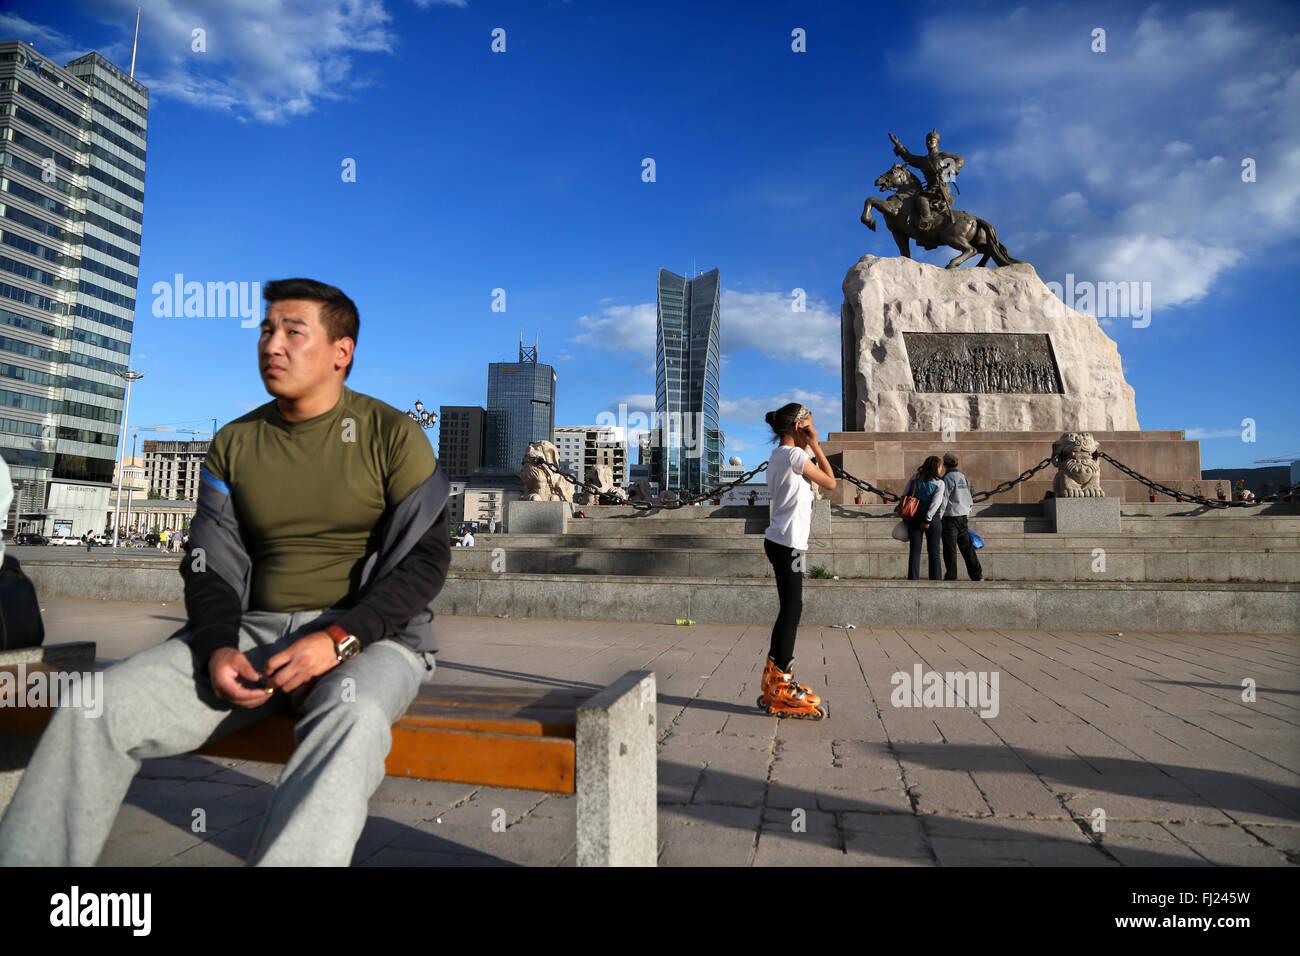 Genghis Khan Square, Ulanbataar - Stock Image